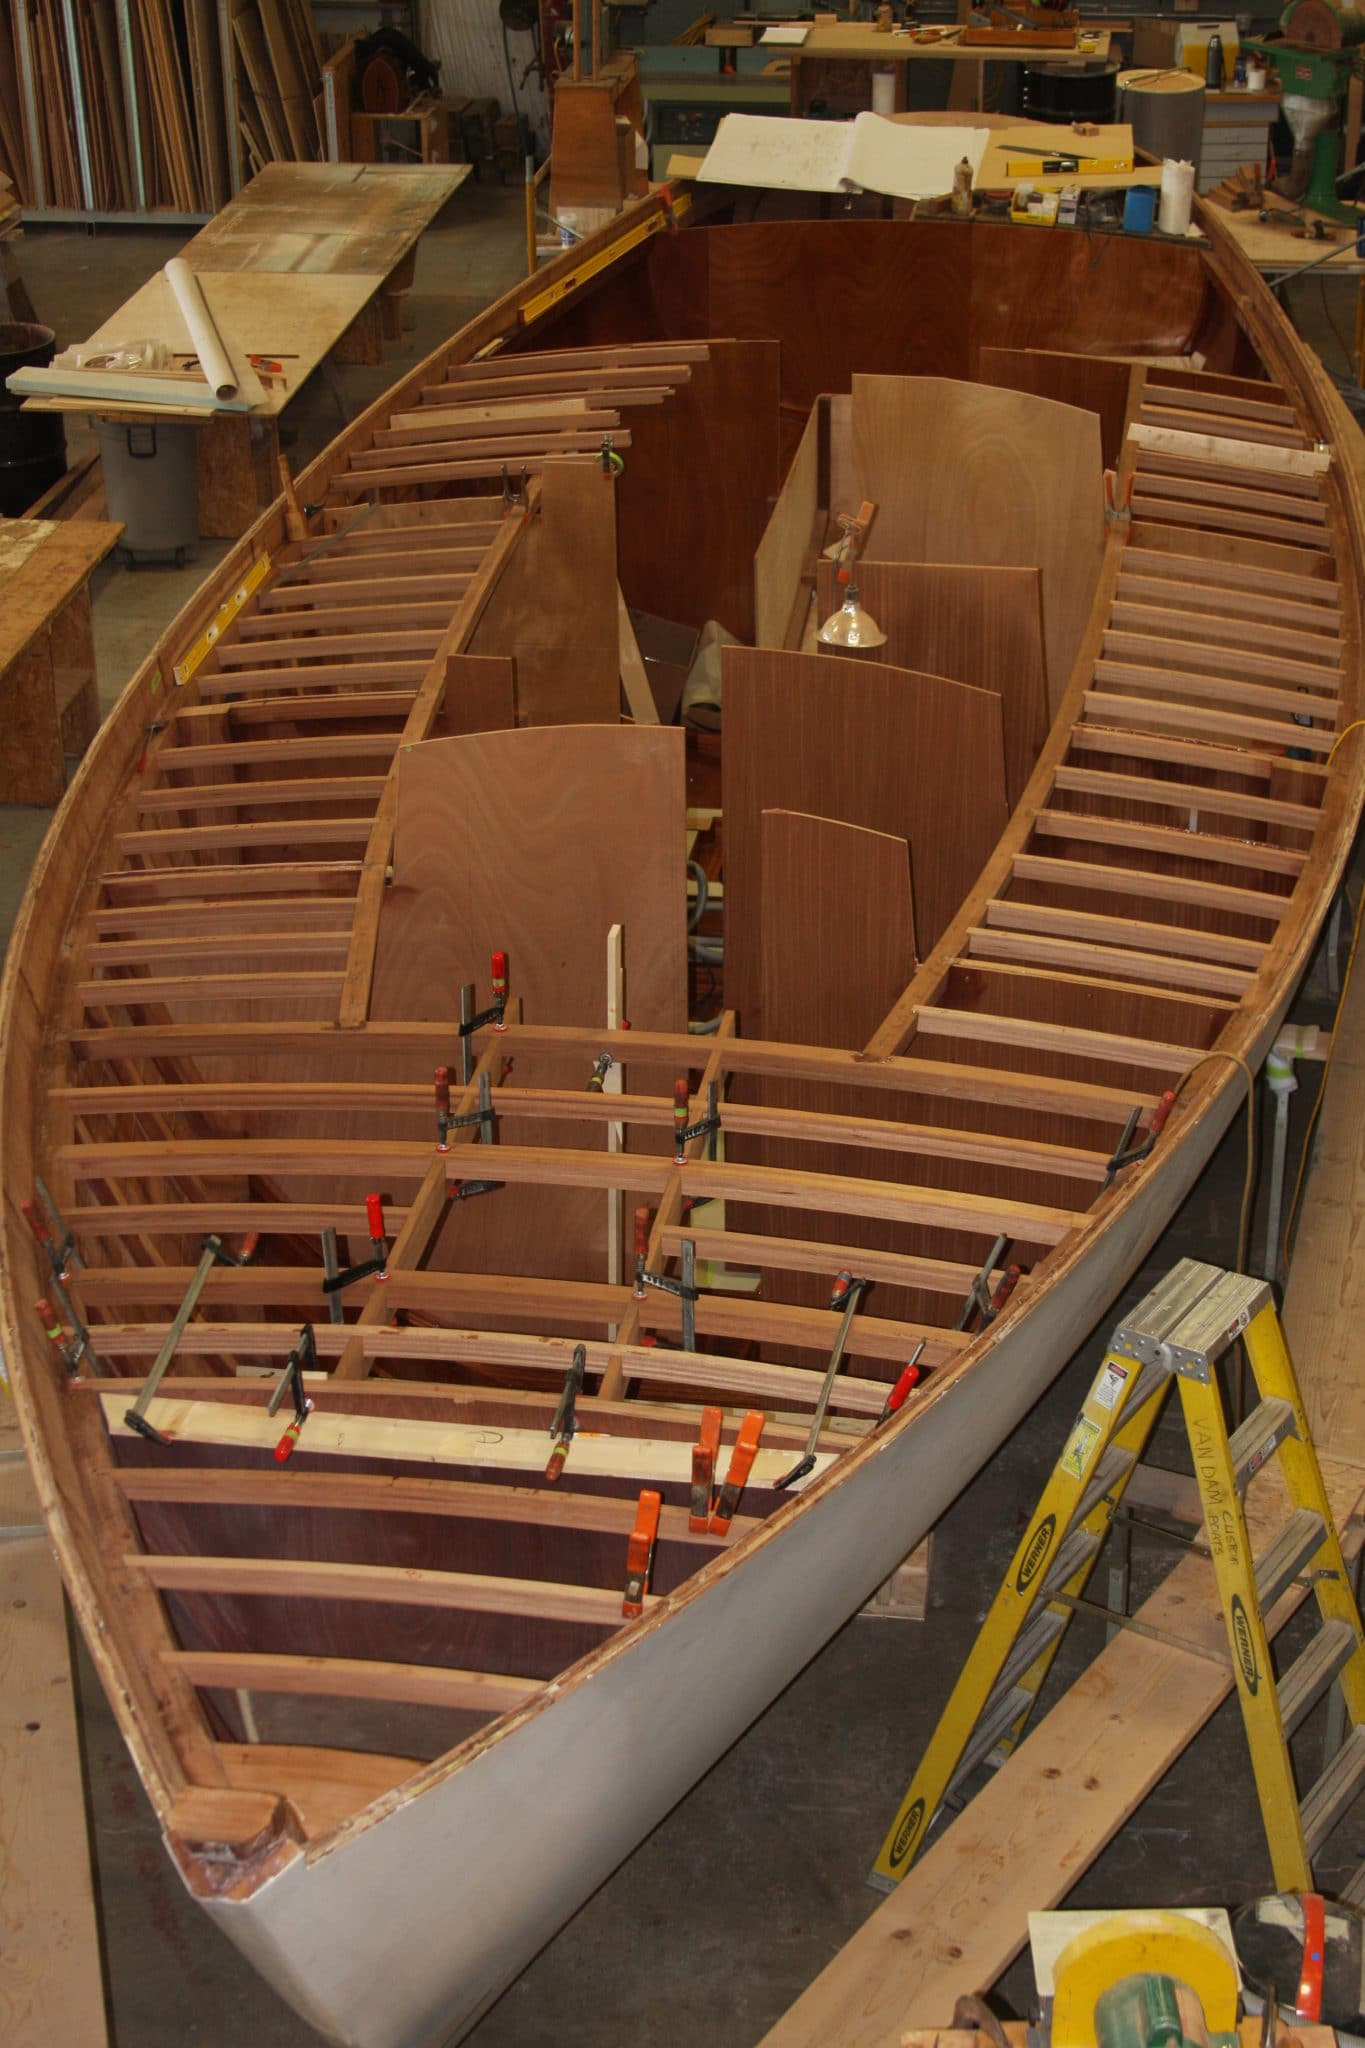 Deck construction continues on Italmas